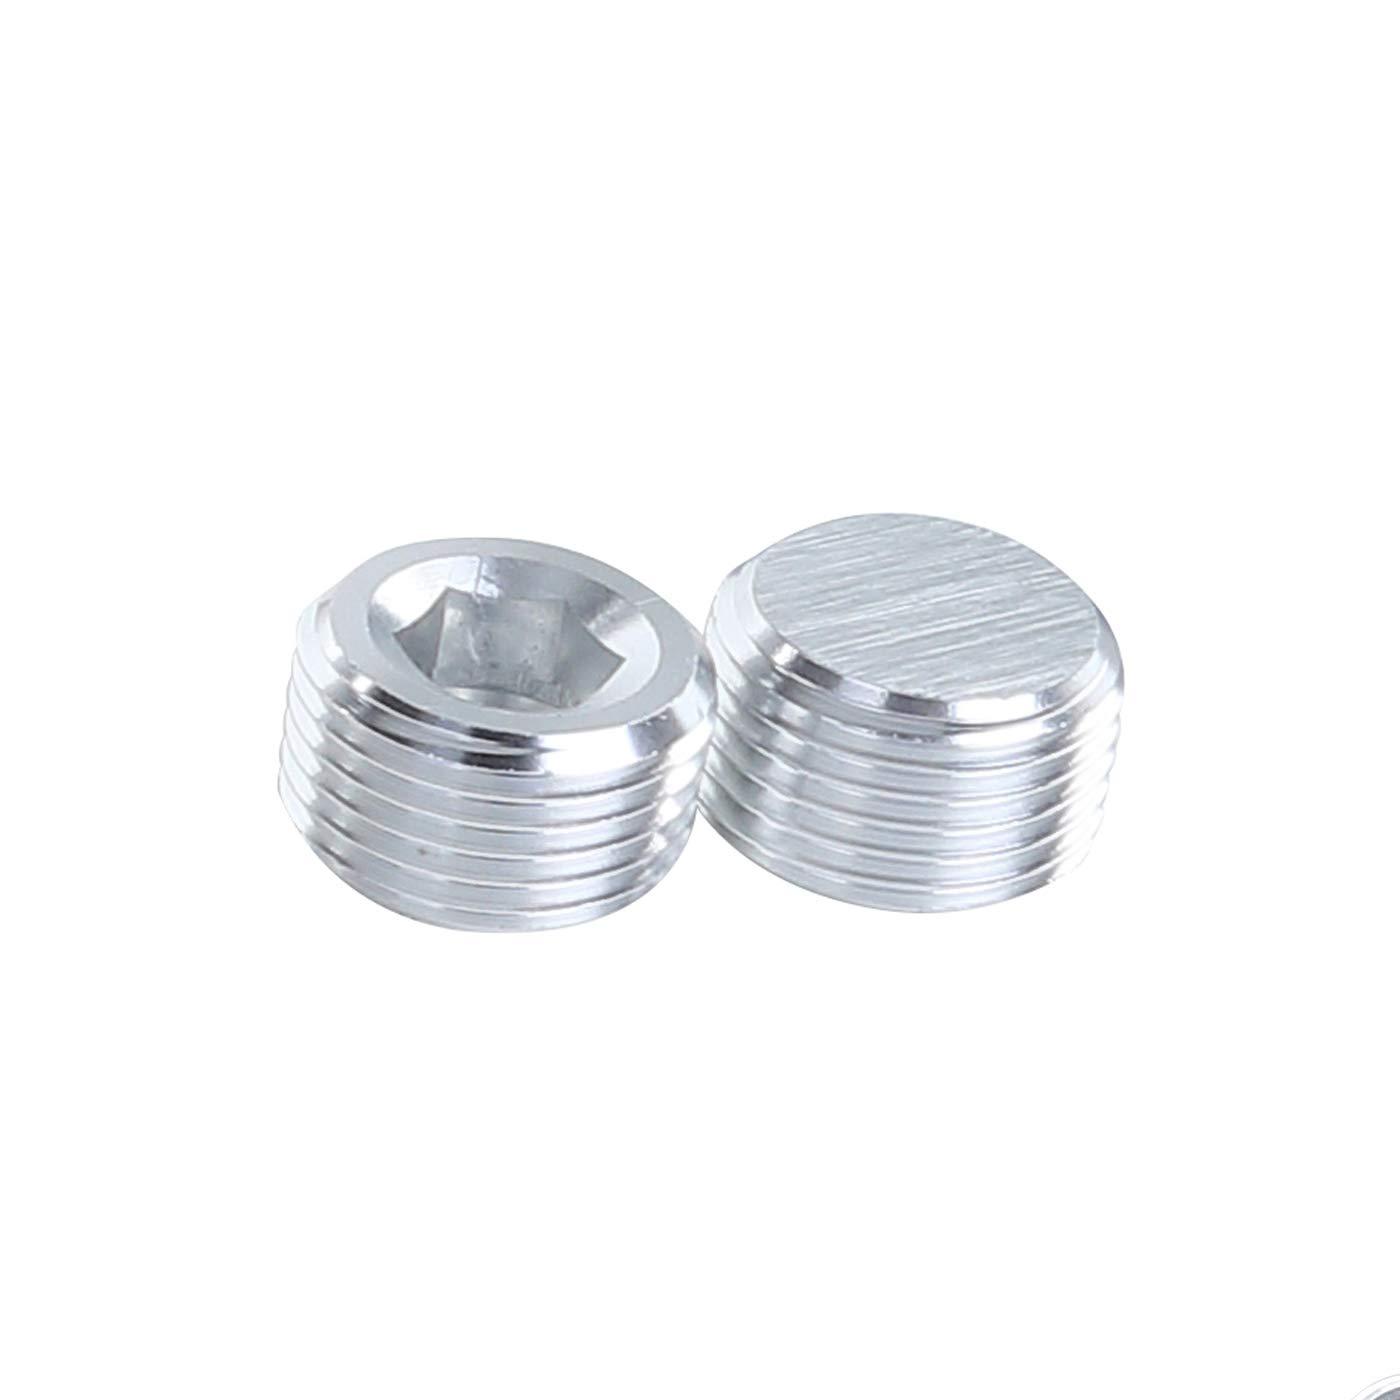 Plain Aluminum 3/4'' NPT Thread Allen Head Socket Pipe Plugs, Silver, Pack of 2